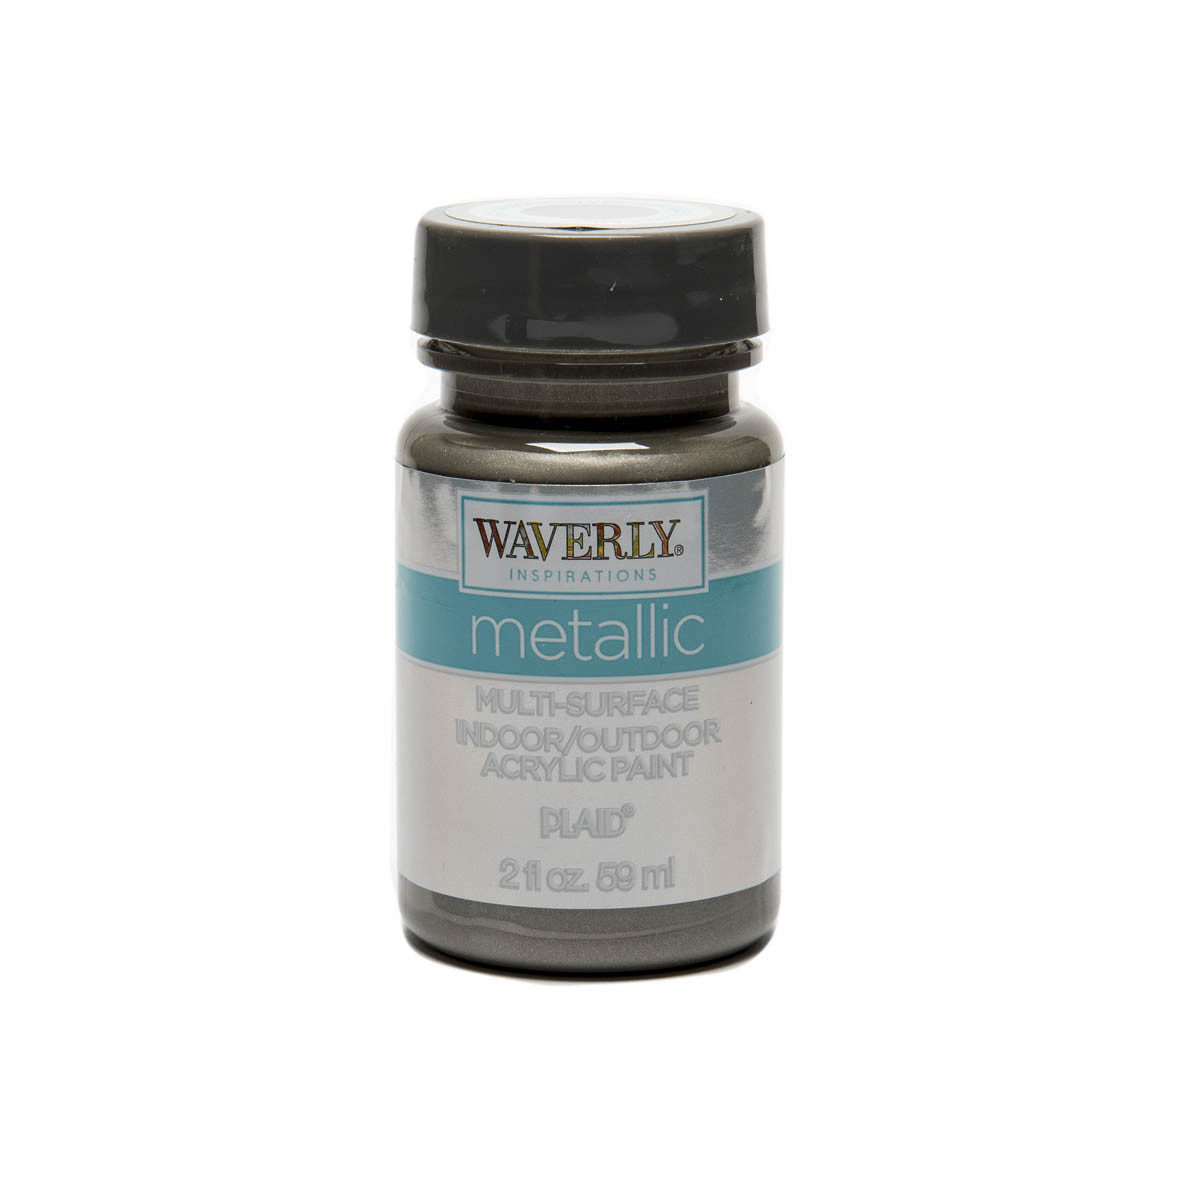 Waverly ® Inspirations Metallic Multi-Surface Acrylic Paint - Antique Silver, 2 oz.